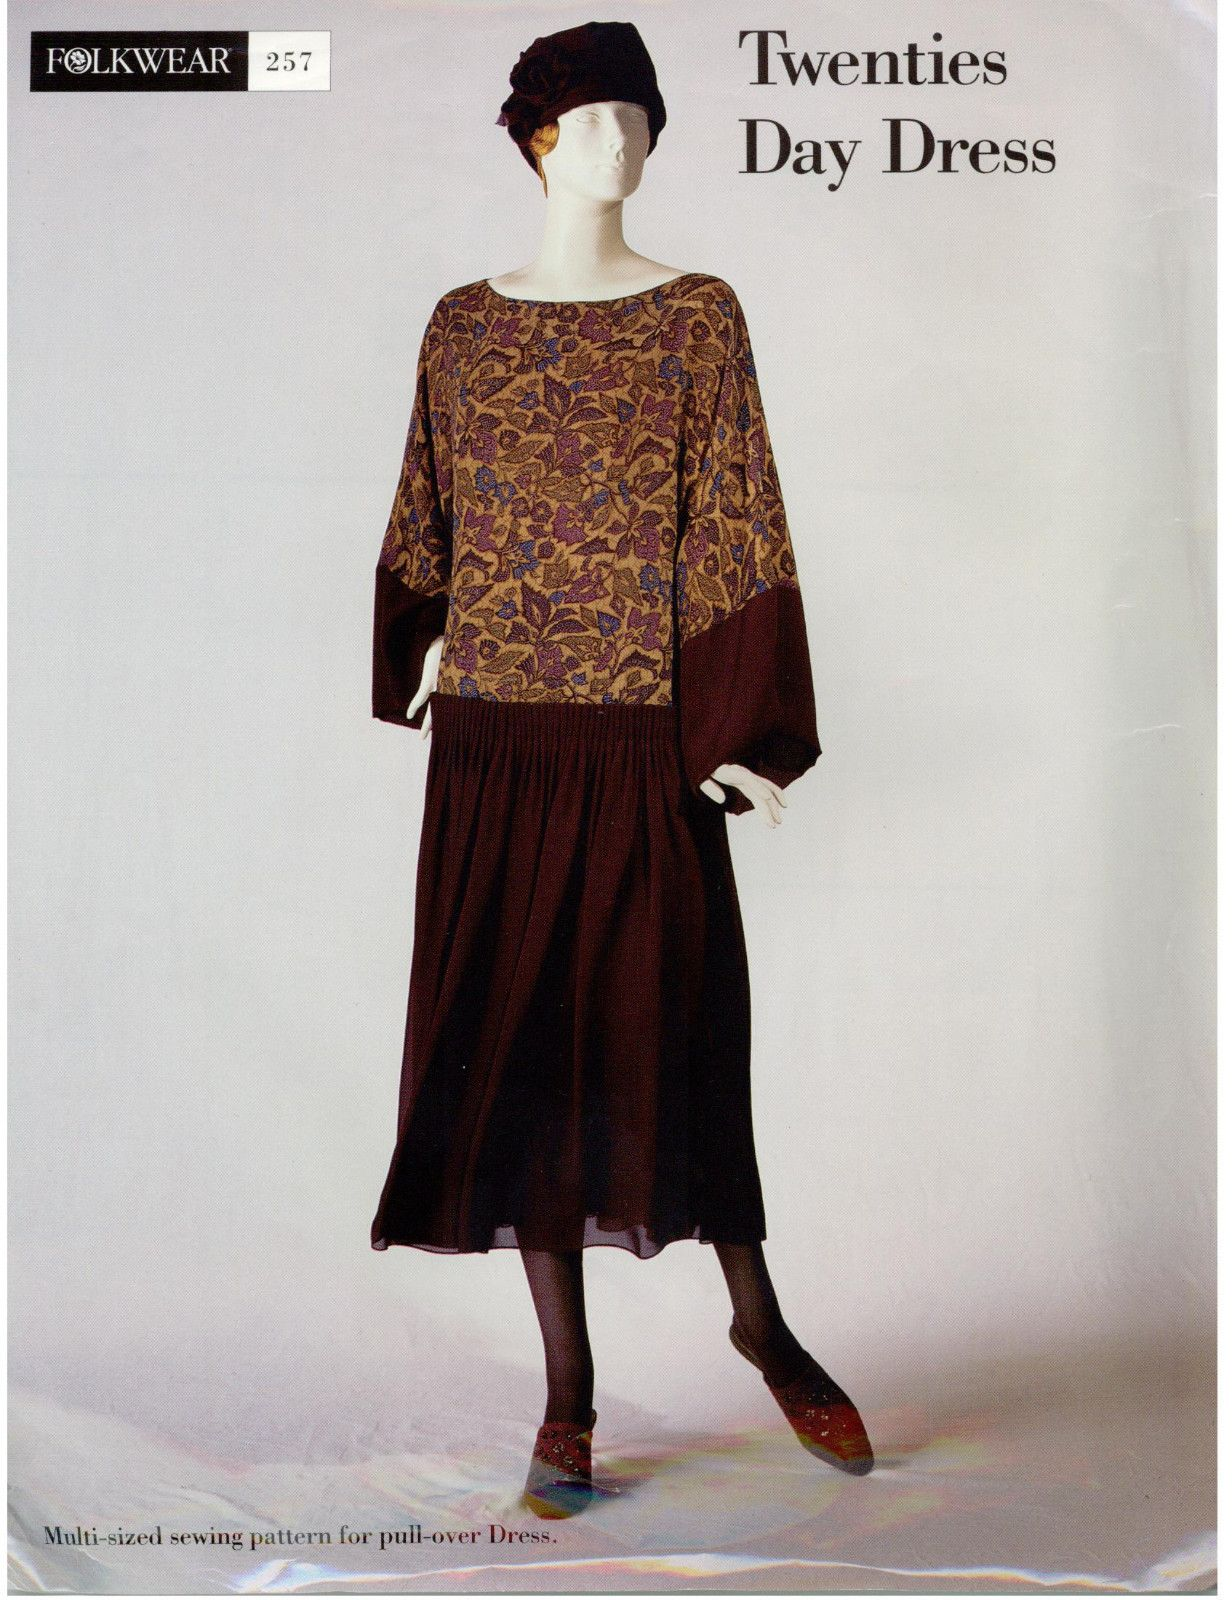 Vintage FOLKWEAR 20s Twenties Day Dress Sewing PATTERN ...